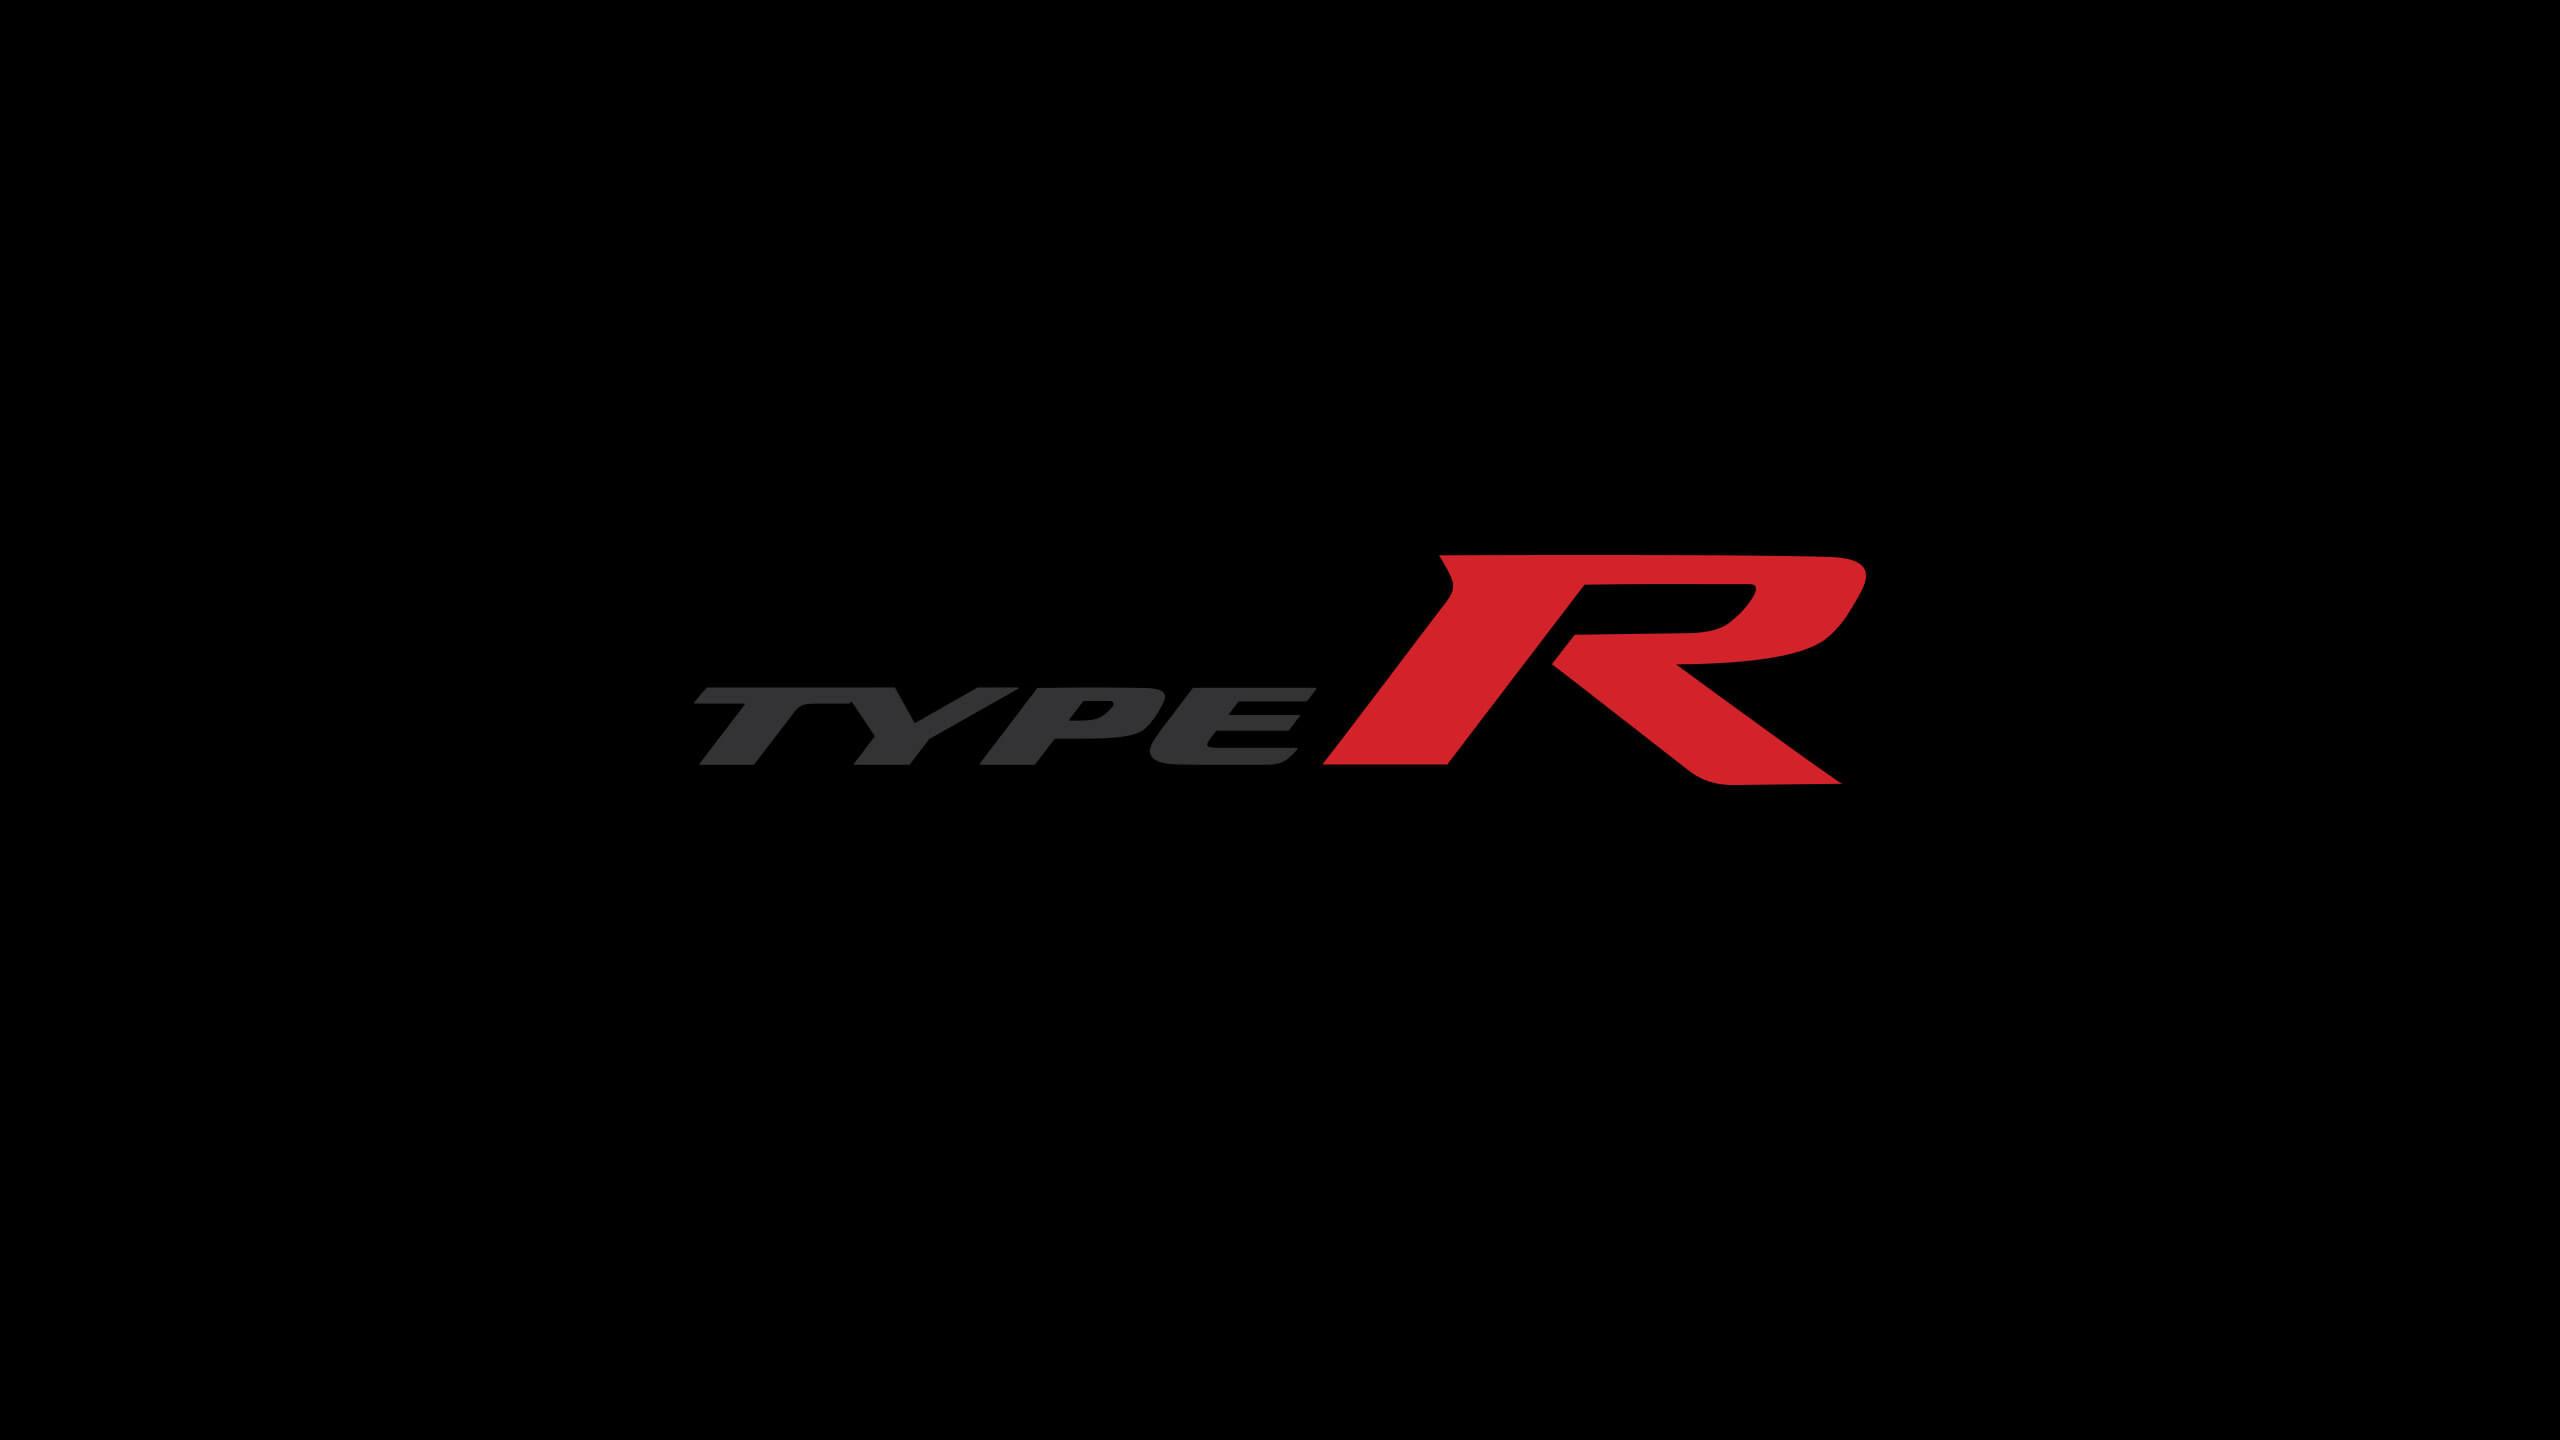 Civic Type R Wallpaper Desktop 05. Download. Civic Type R Wallpaper …